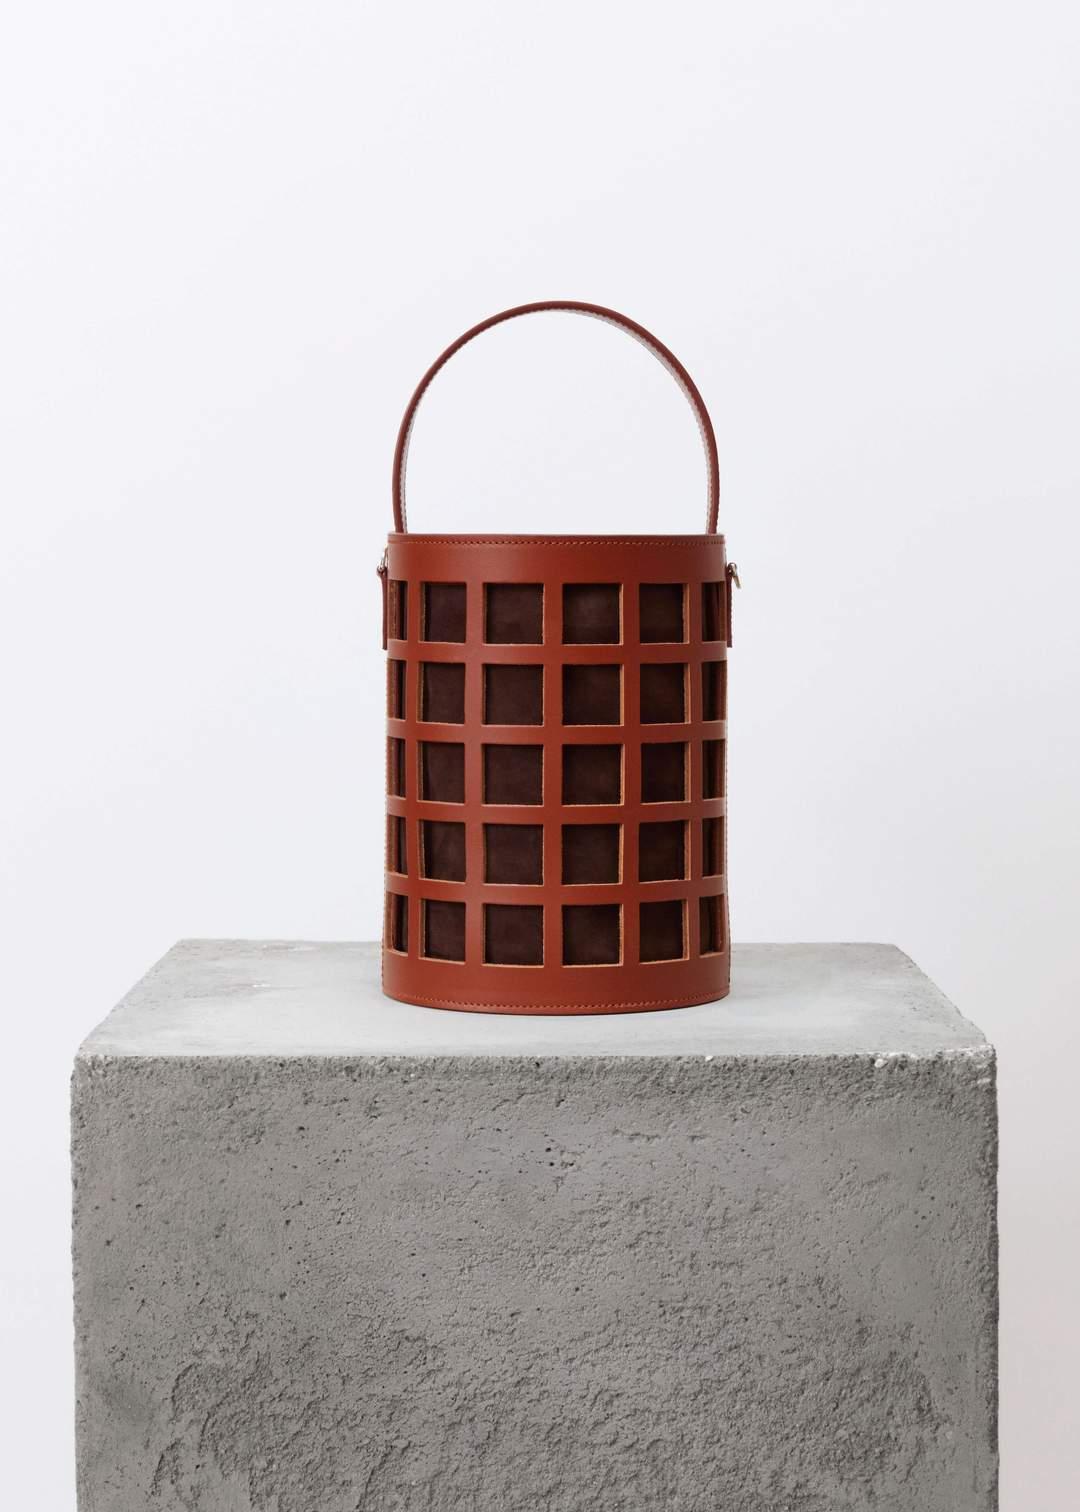 Product Image for Basket Bag, Caramel Chocolat